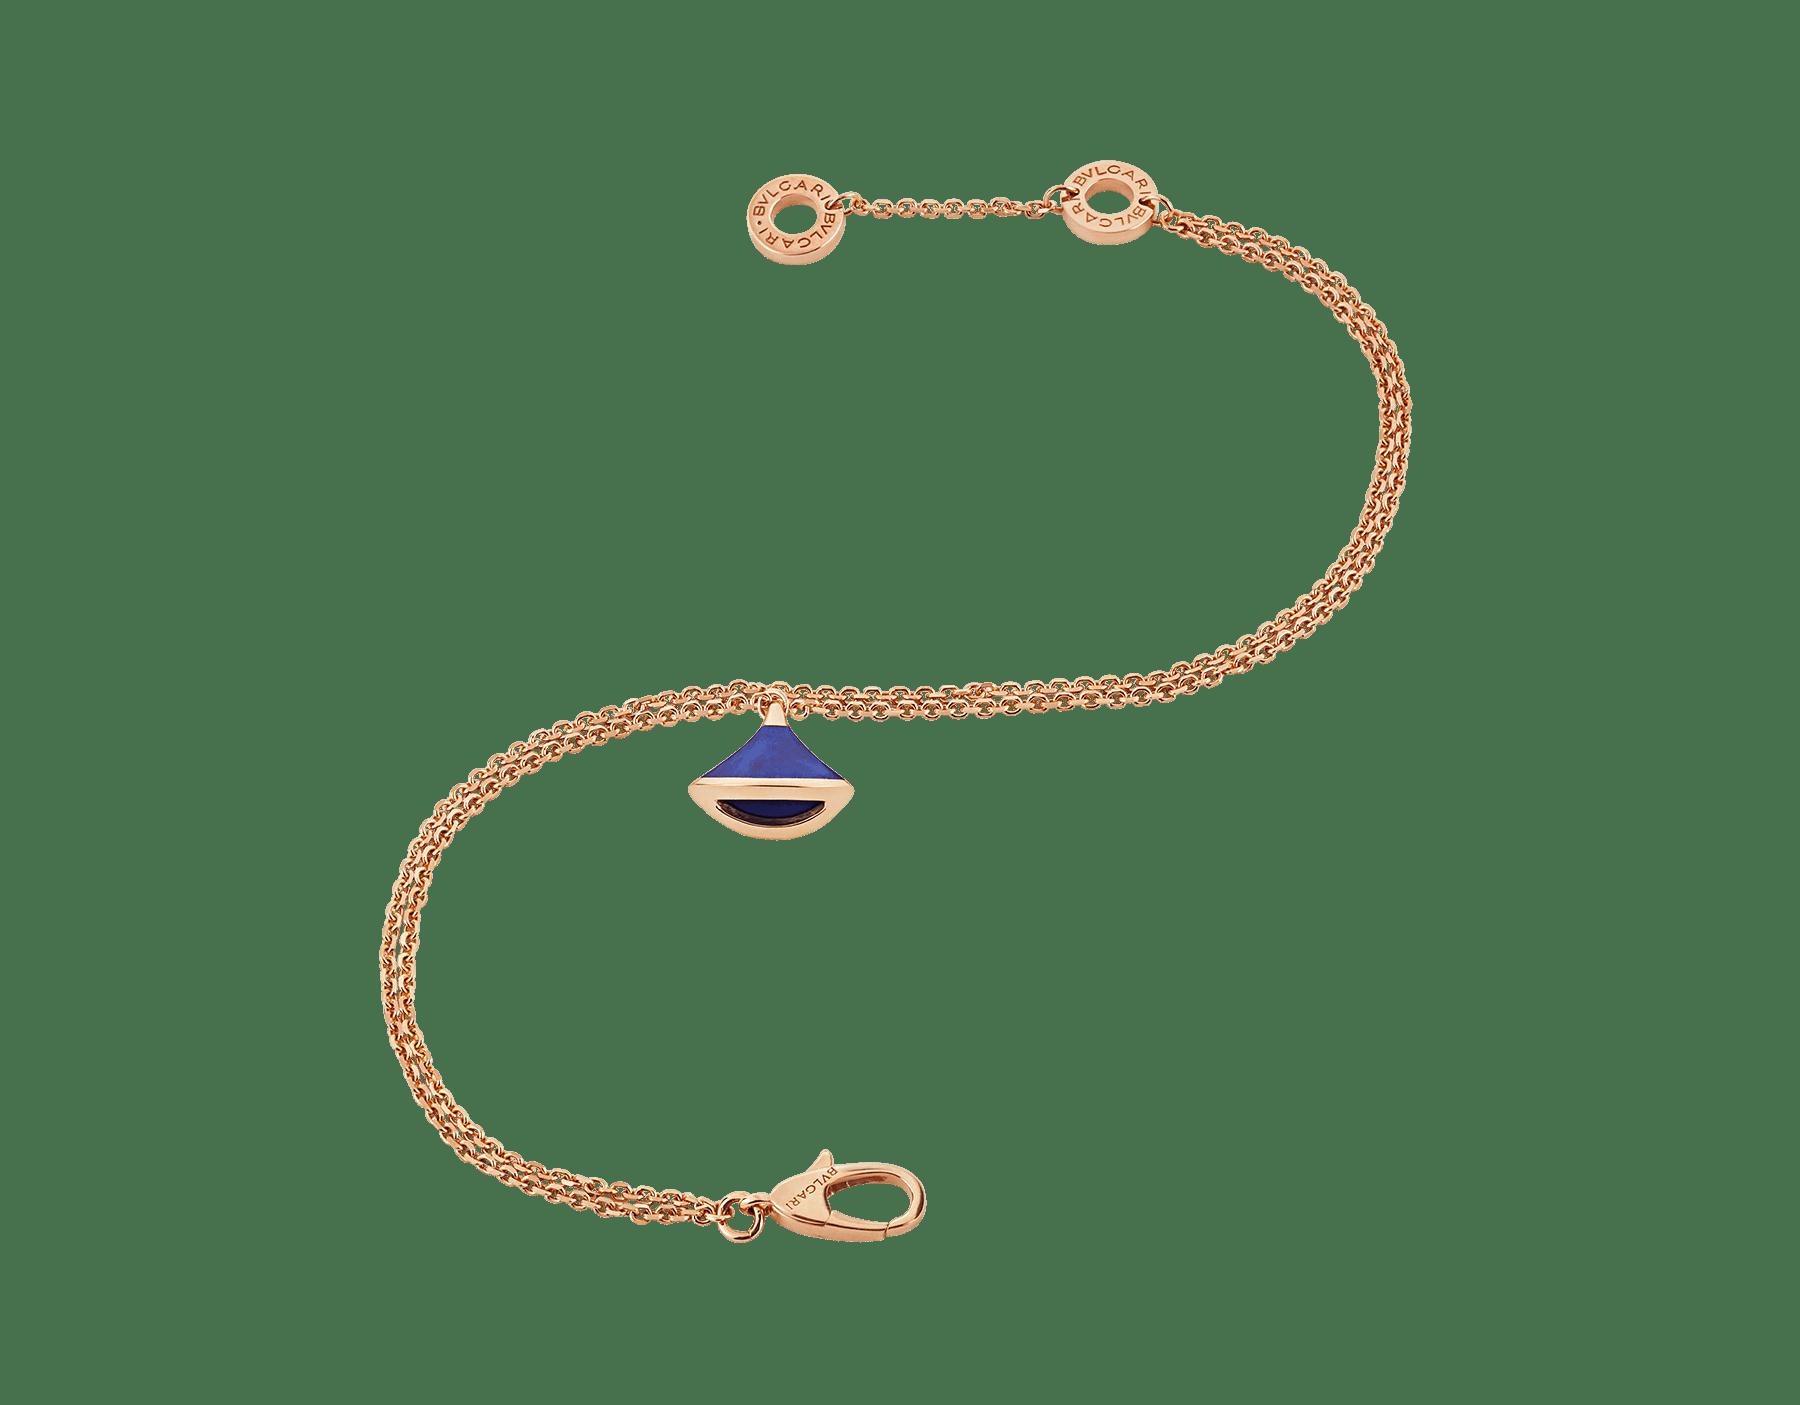 DIVAS' DREAM bracelet in 18 kt rose gold with pendant set with lapis lazuli. BR857290 image 2